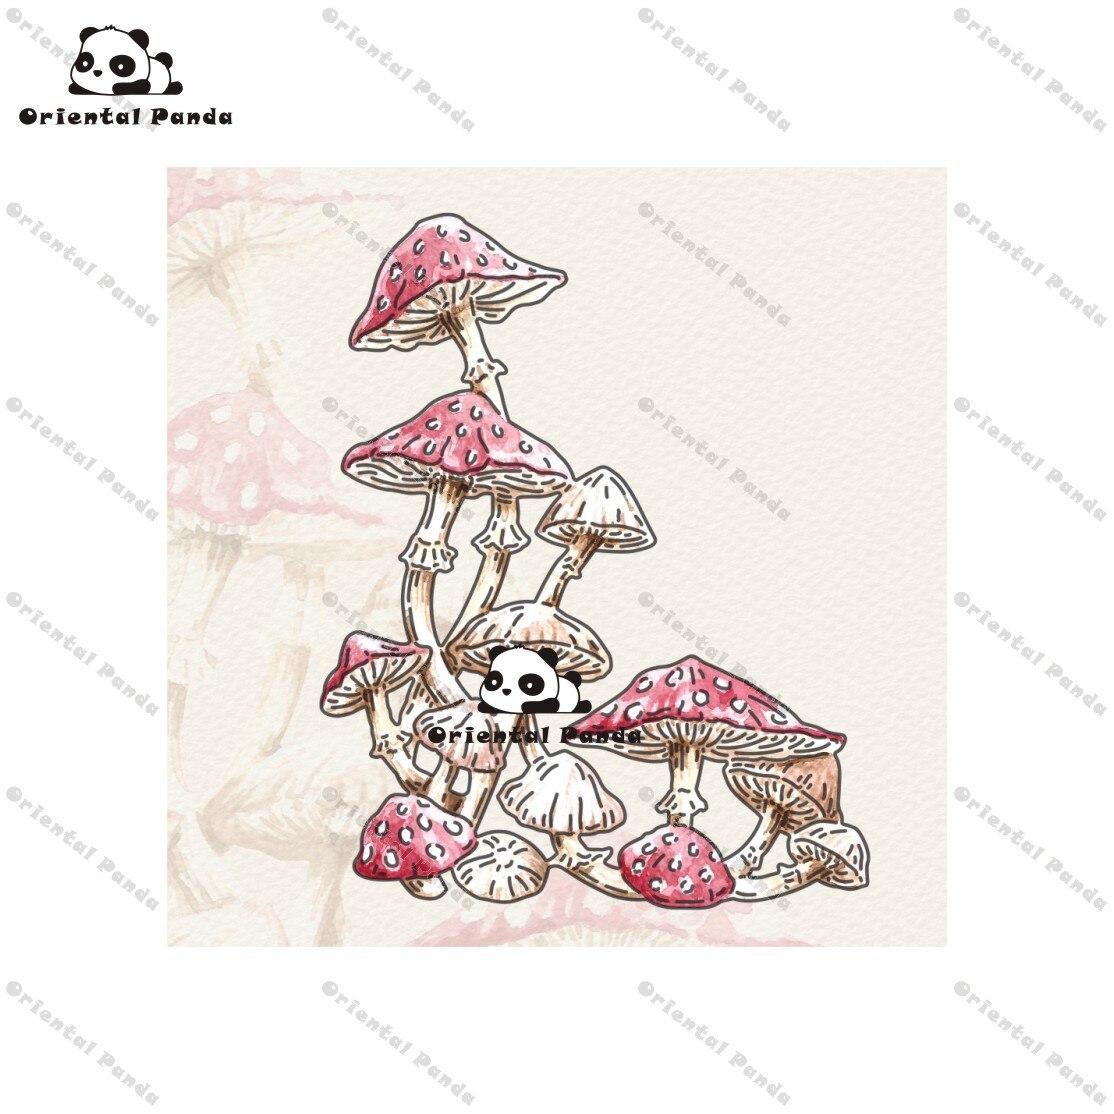 New Dies 2020 Poisonous Fungi Metal Cutting Dies Diy Dies Photo Album  Cutting Dies Scrapbooking Stencil Die Cuts Card Making